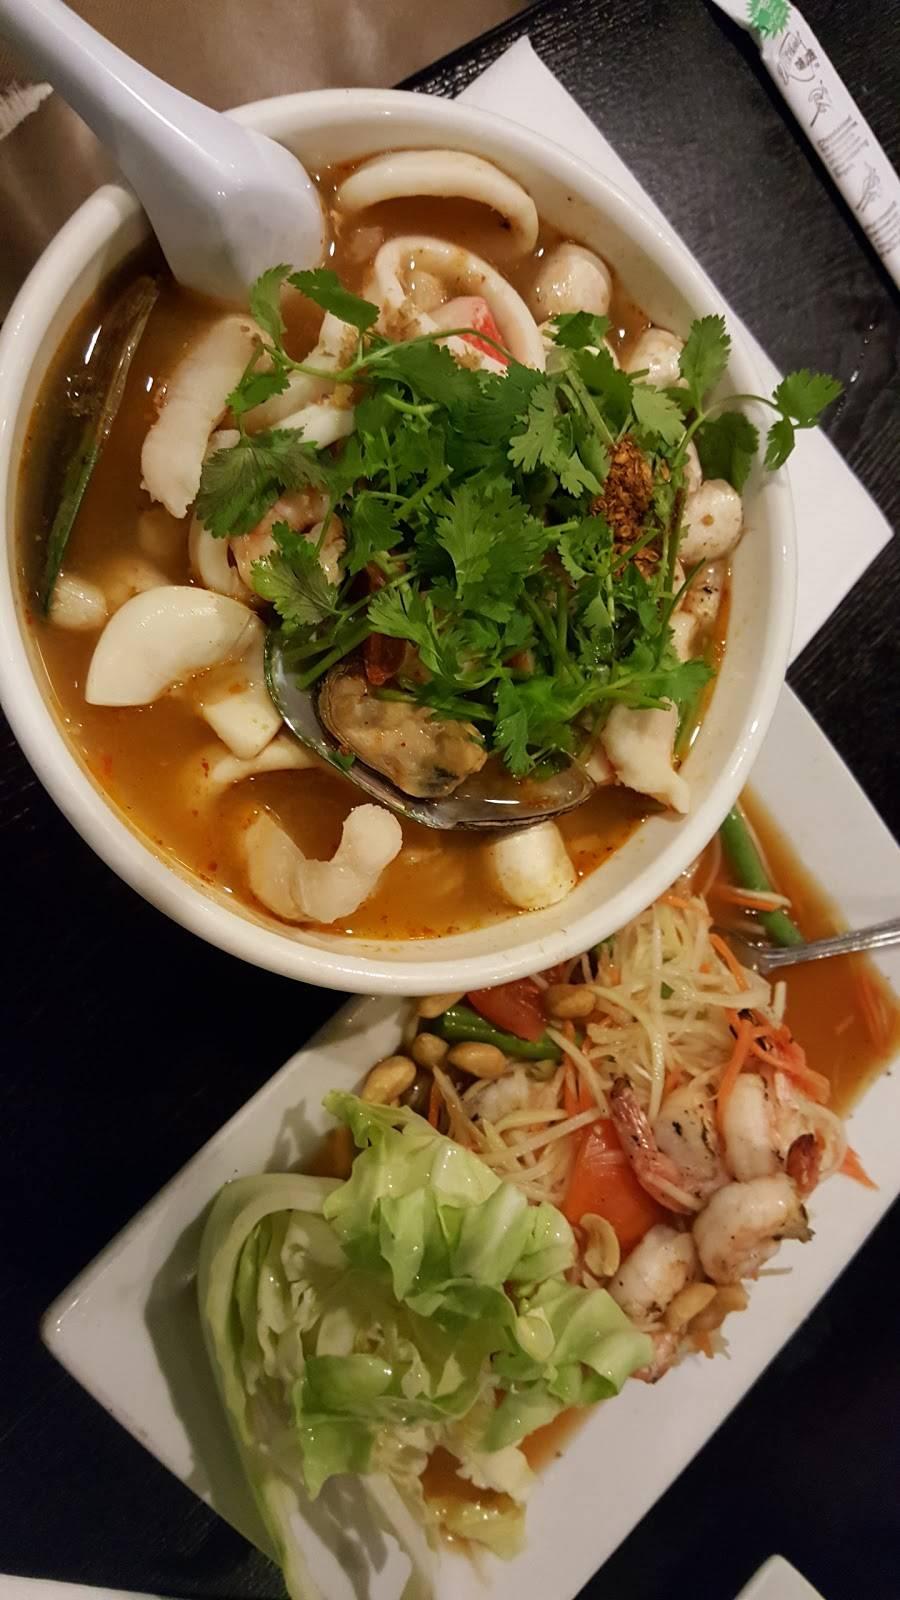 You & I Thai Cuisine   restaurant   623 N Euclid St, Anaheim, CA 92801, USA   7144900555 OR +1 714-490-0555